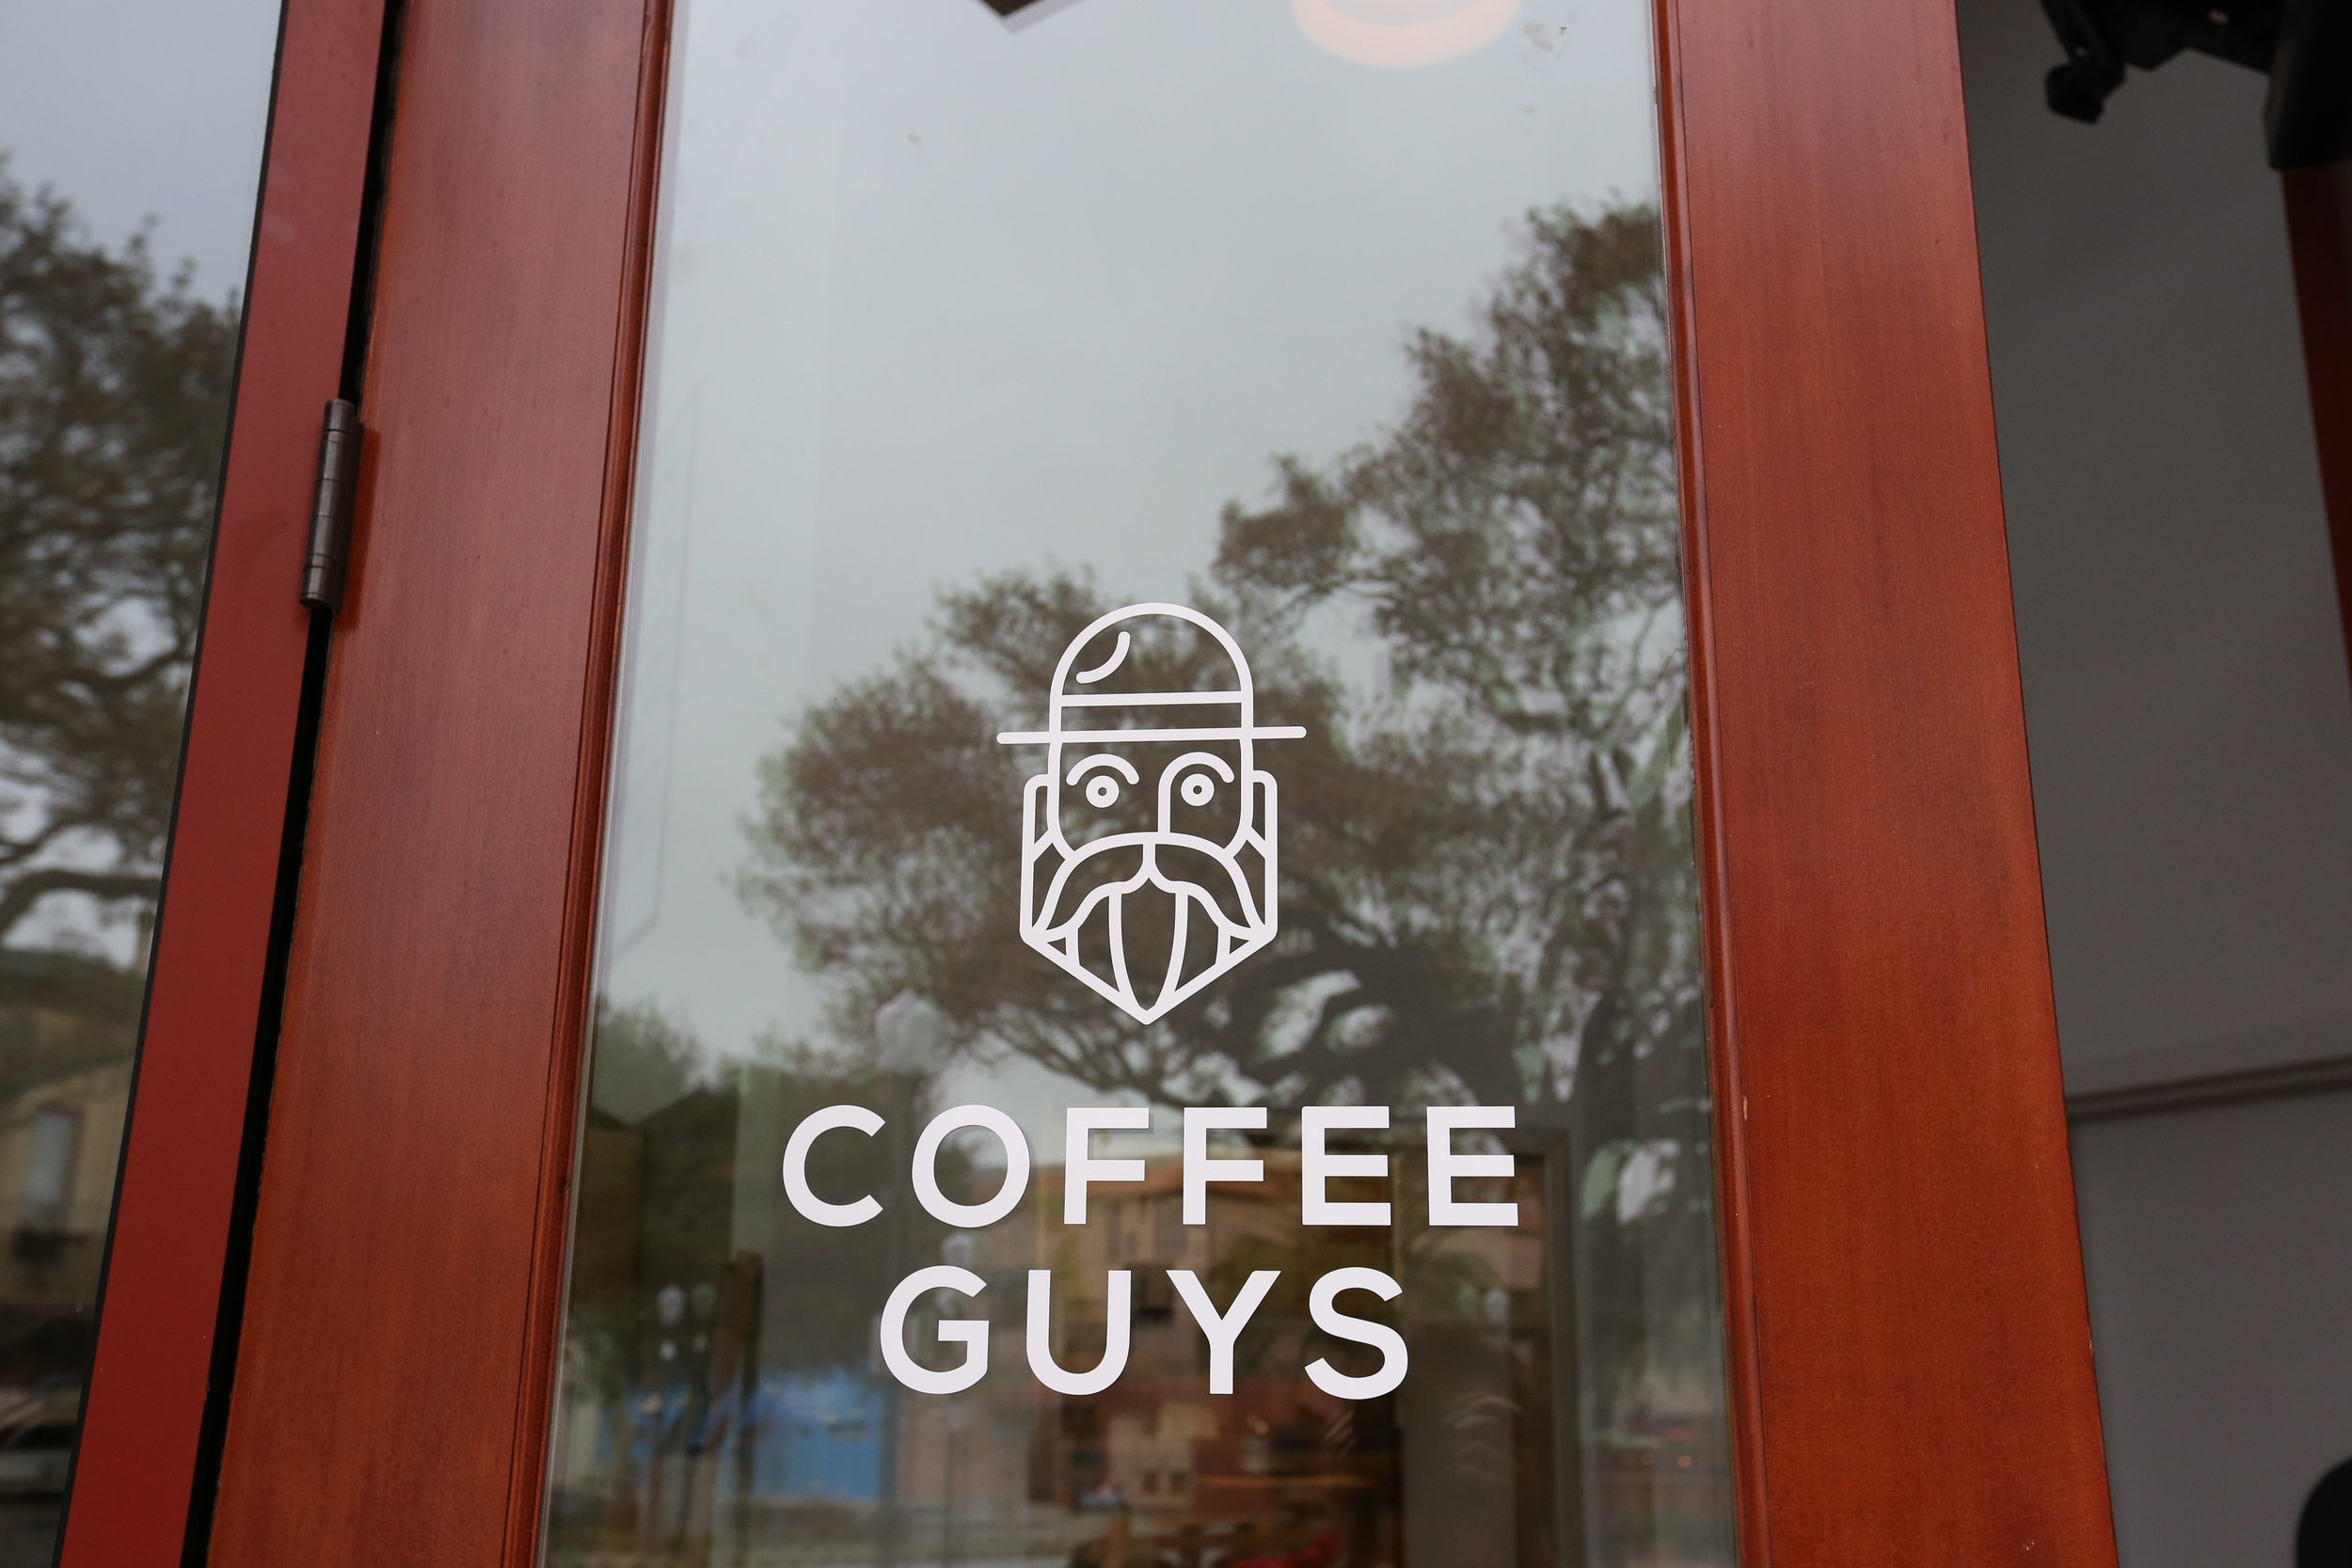 CoffeeGuyFinal9.jpg